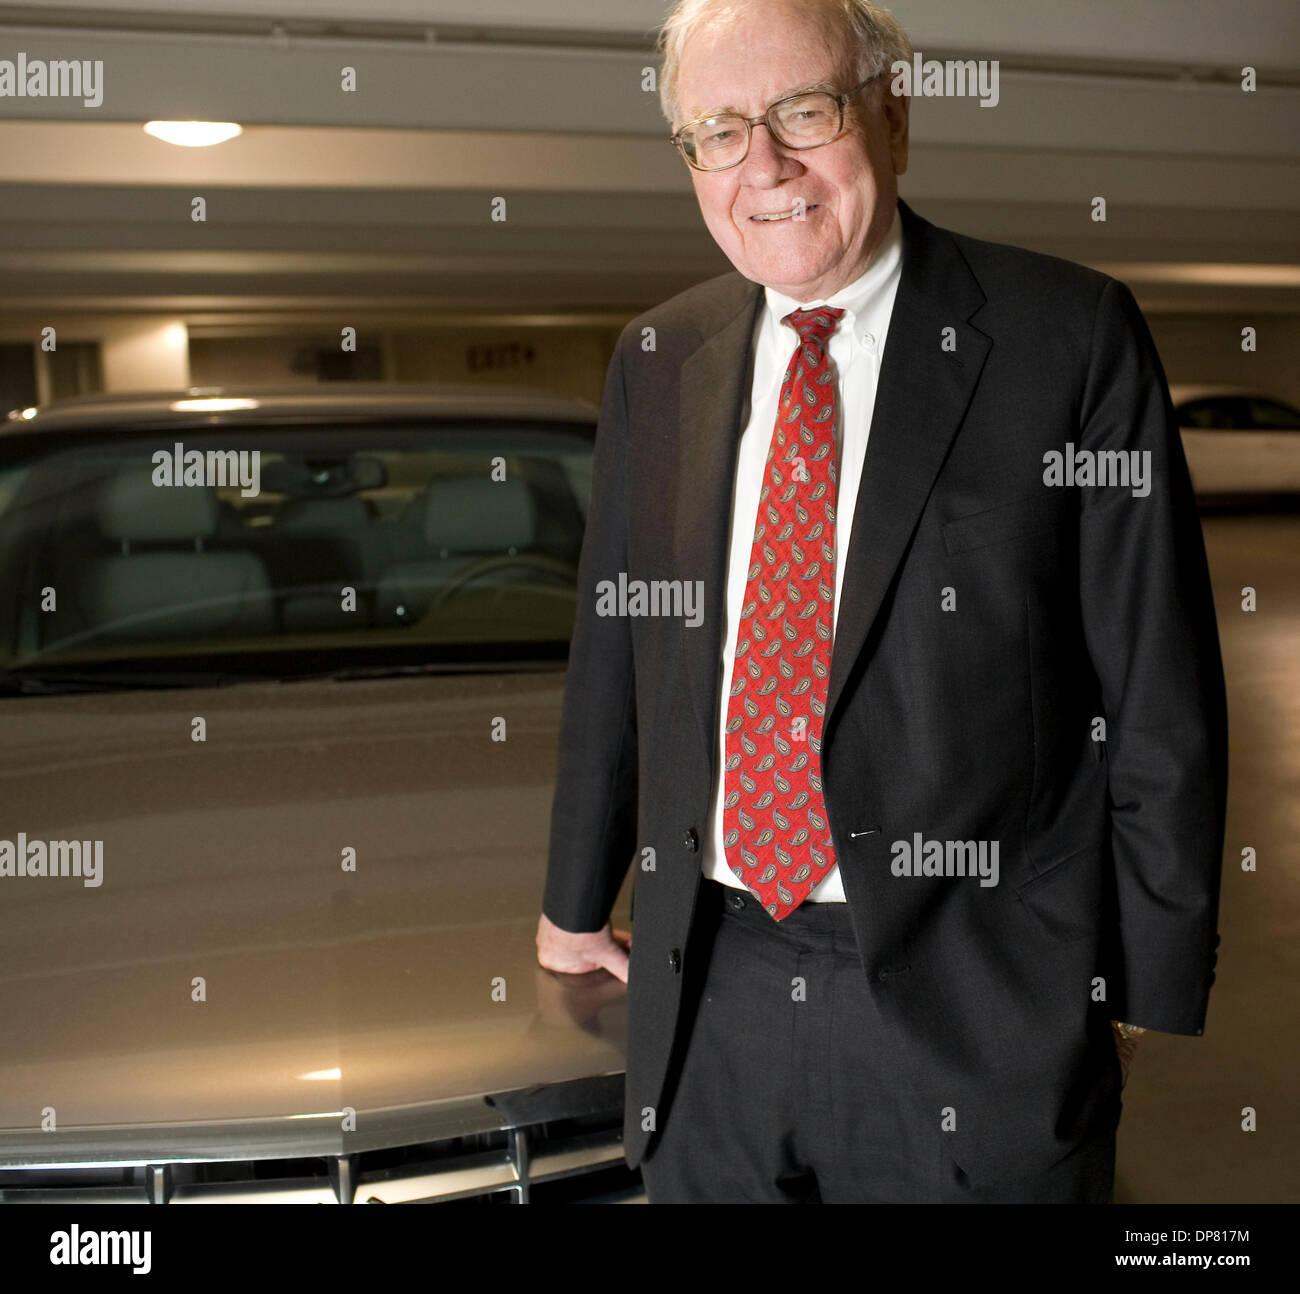 Apr 30, 2006 - Omaha, NE, USA - Businessman WARREN BUFFETT with his new Cadillac. (Credit Image: © James Colburn/ZUMA Press) RESTRICTIONS: - Stock Image